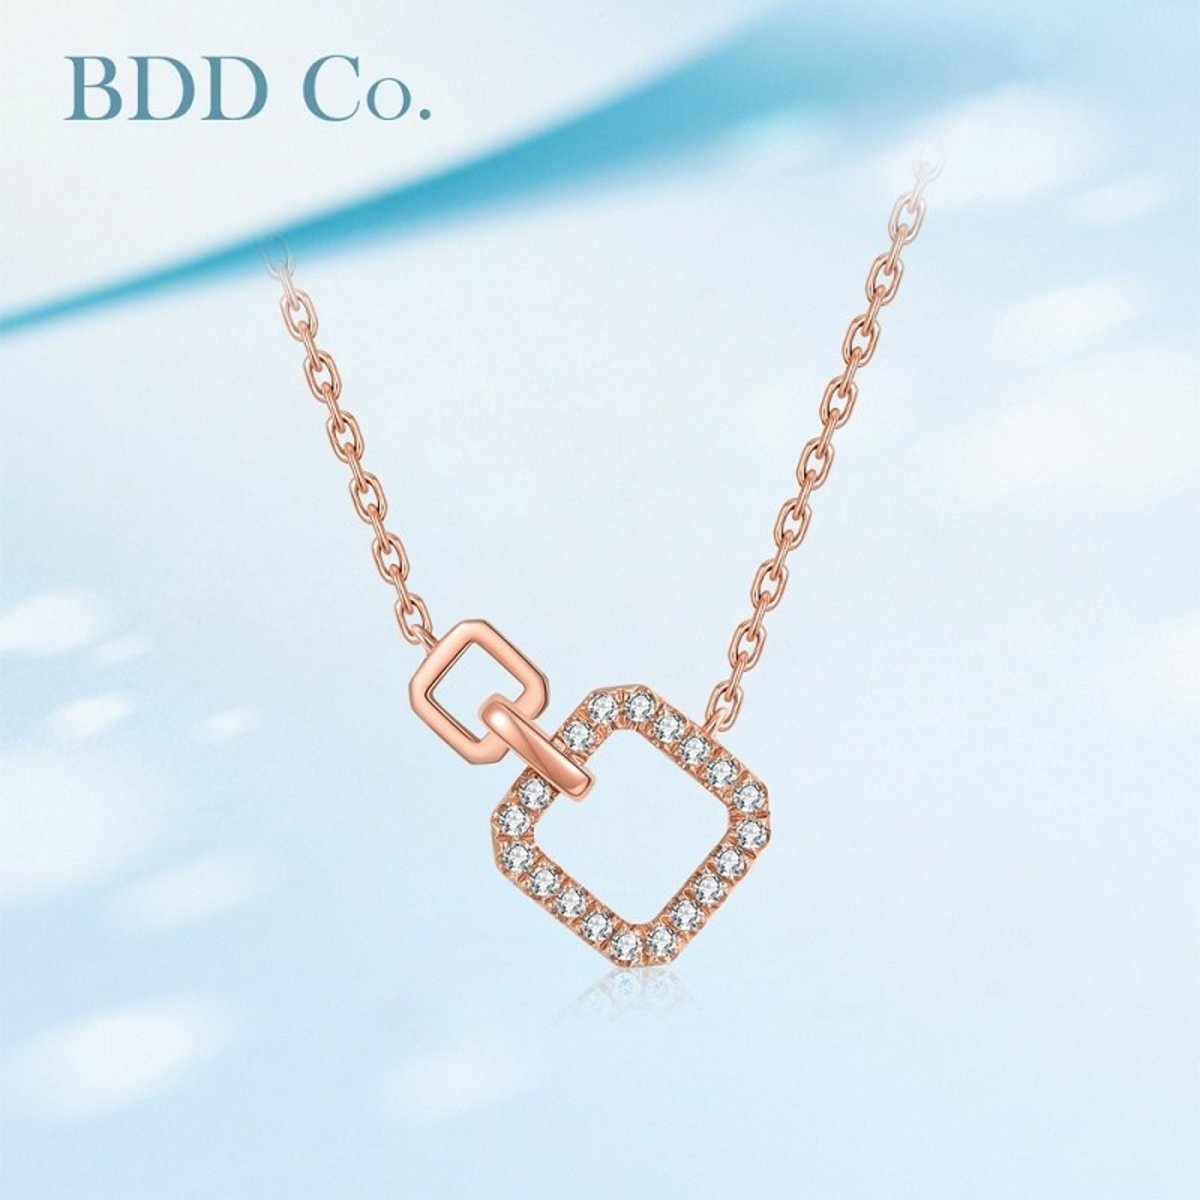 【BDD-Co.】18k玫瑰金 幾何極簡鑽石項鏈